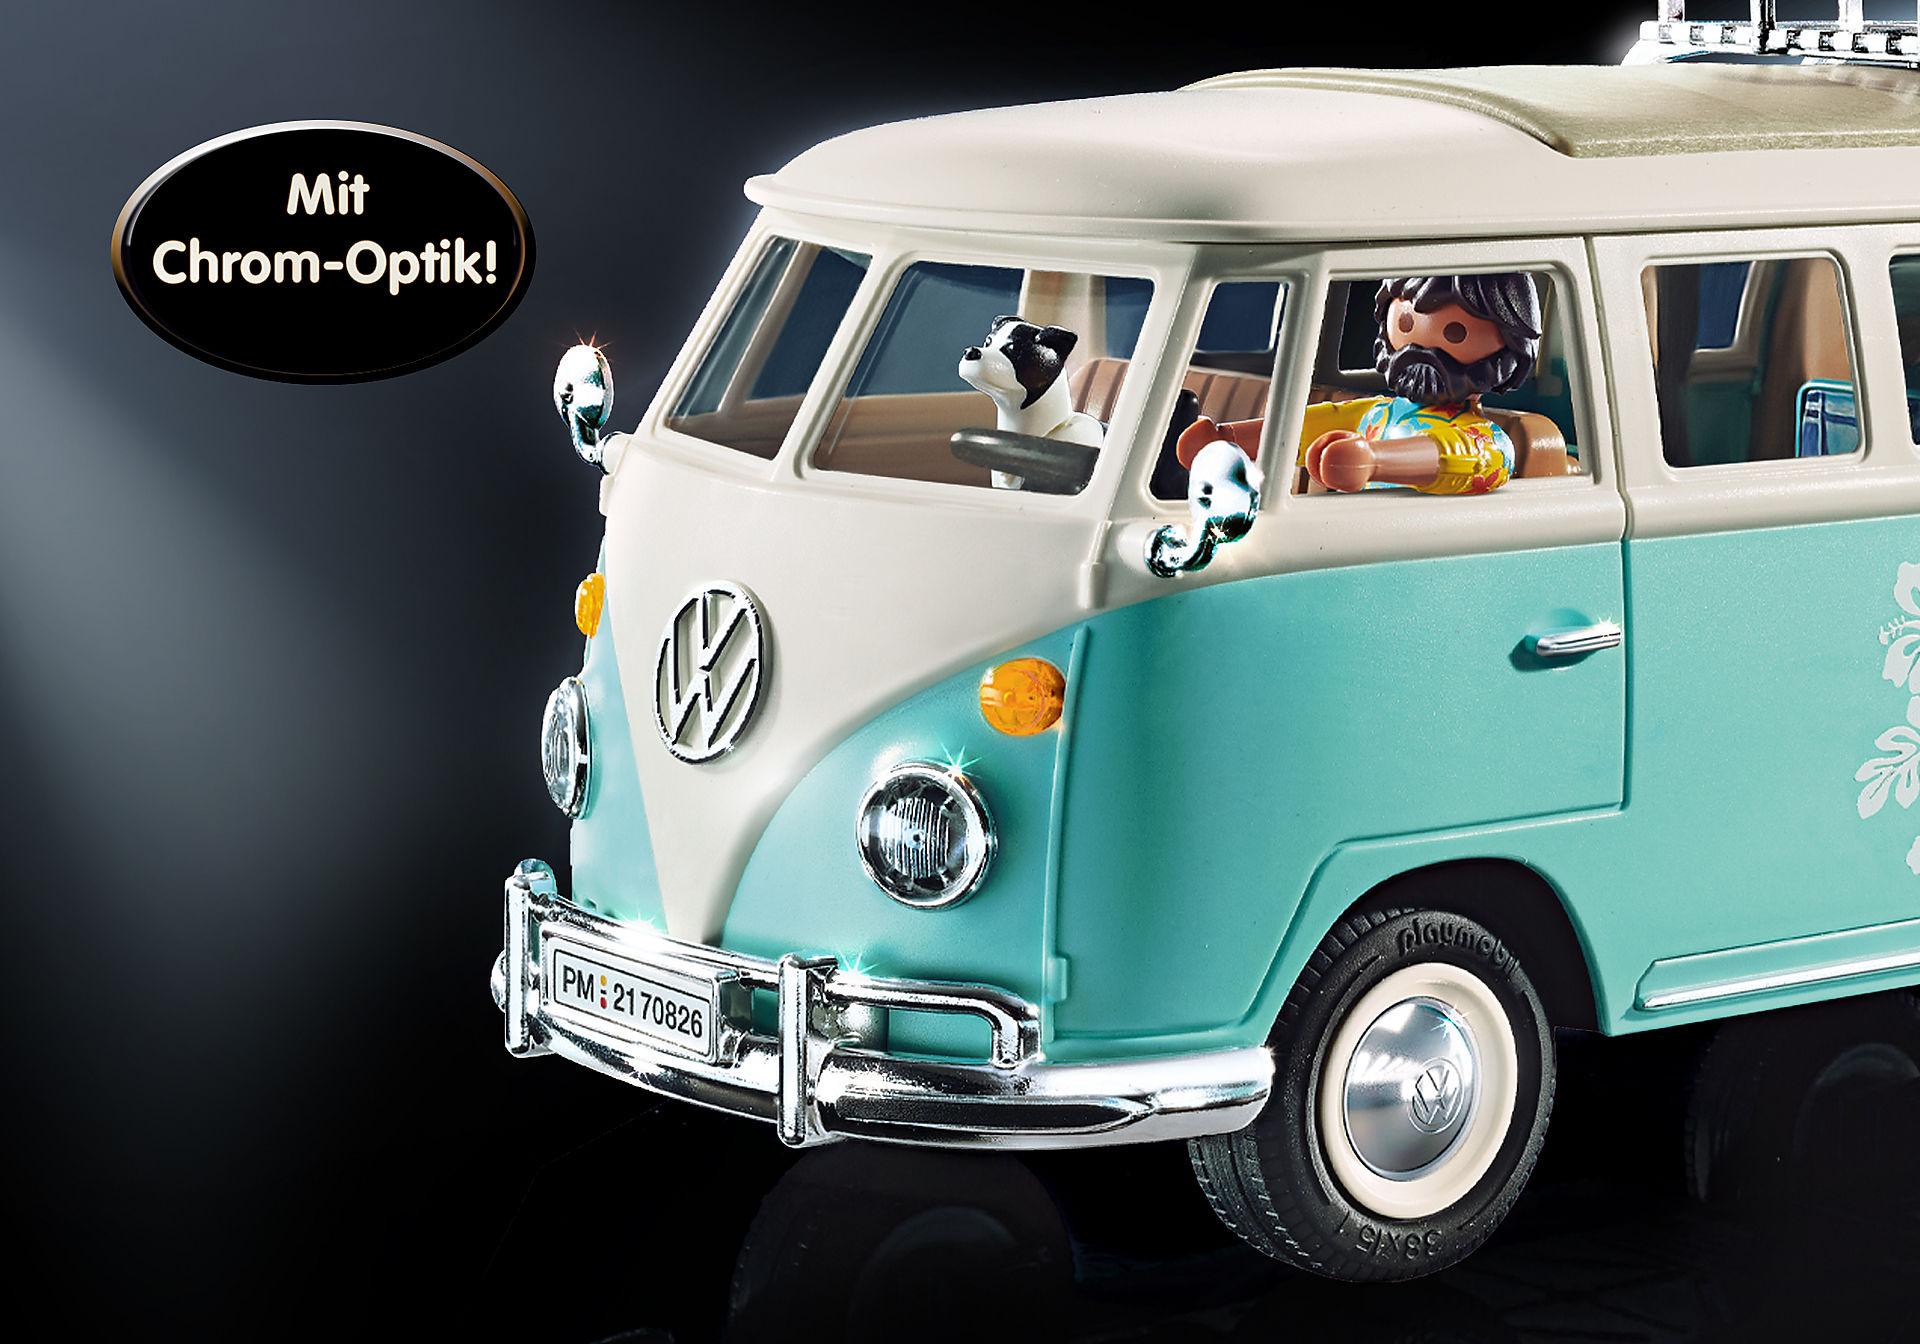 70826 Volkswagen T1 Camping Bus - Edycja specjalna zoom image4